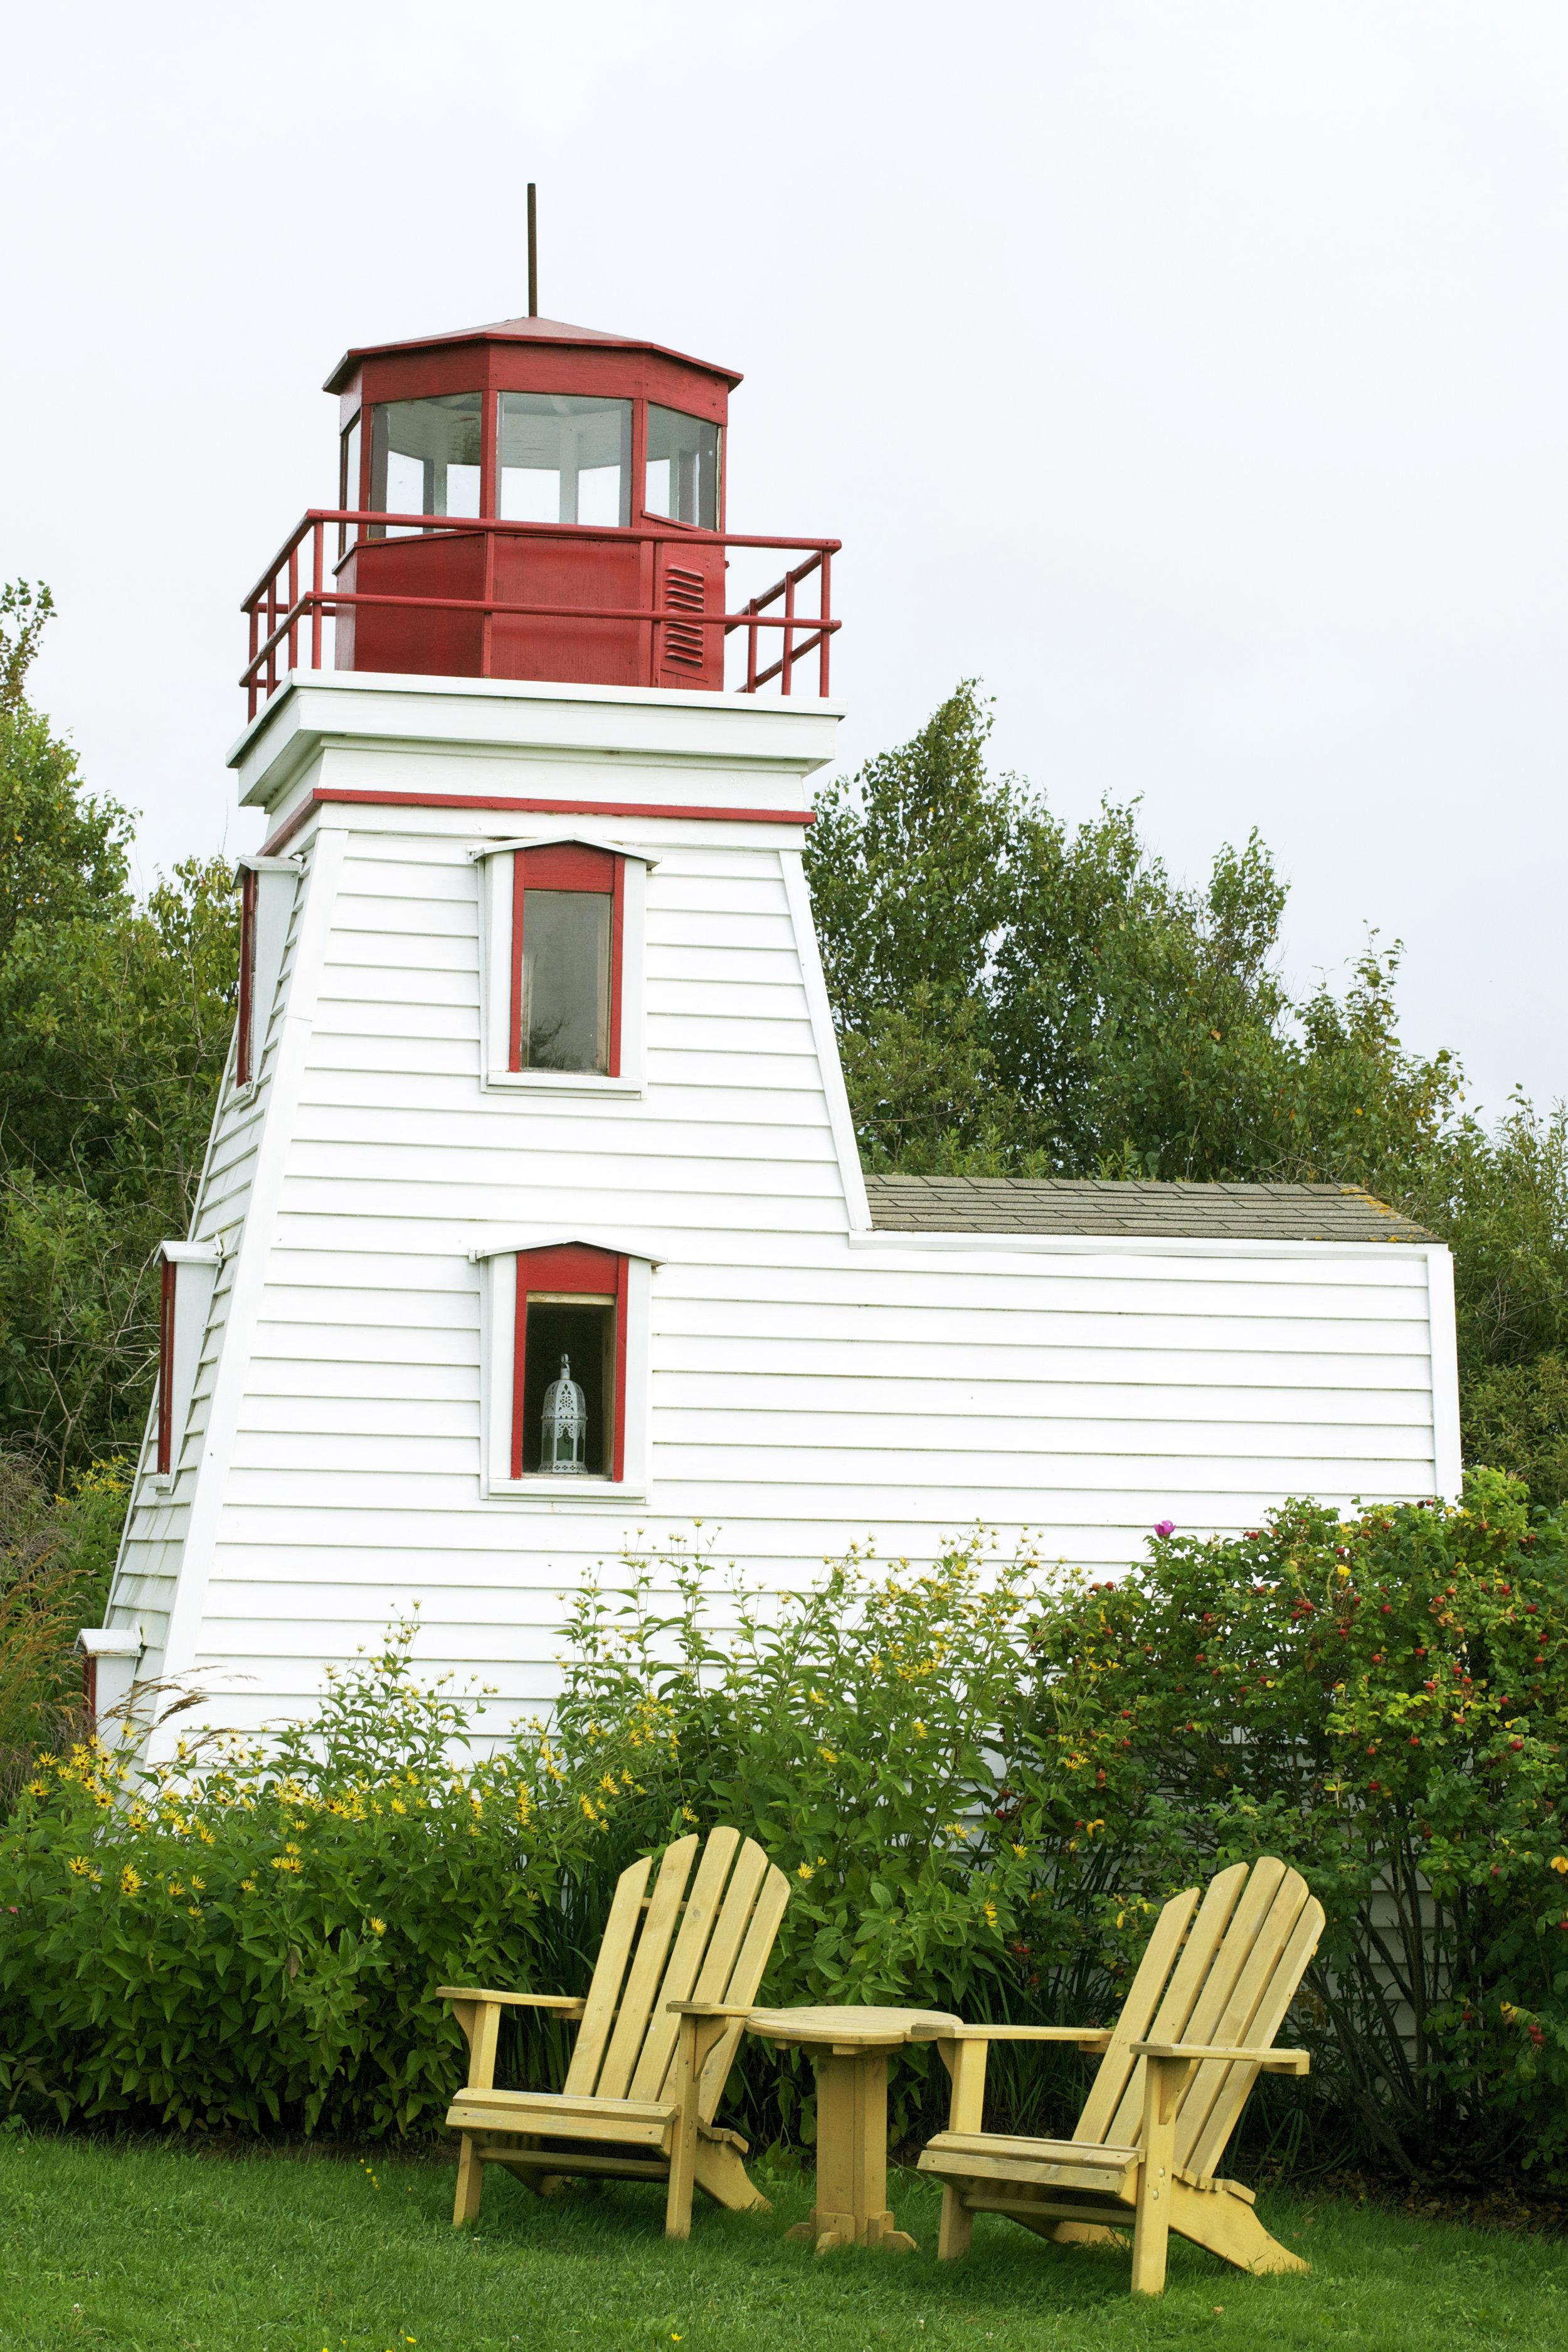 adirondack-chairs-by-lighthouse.jpg